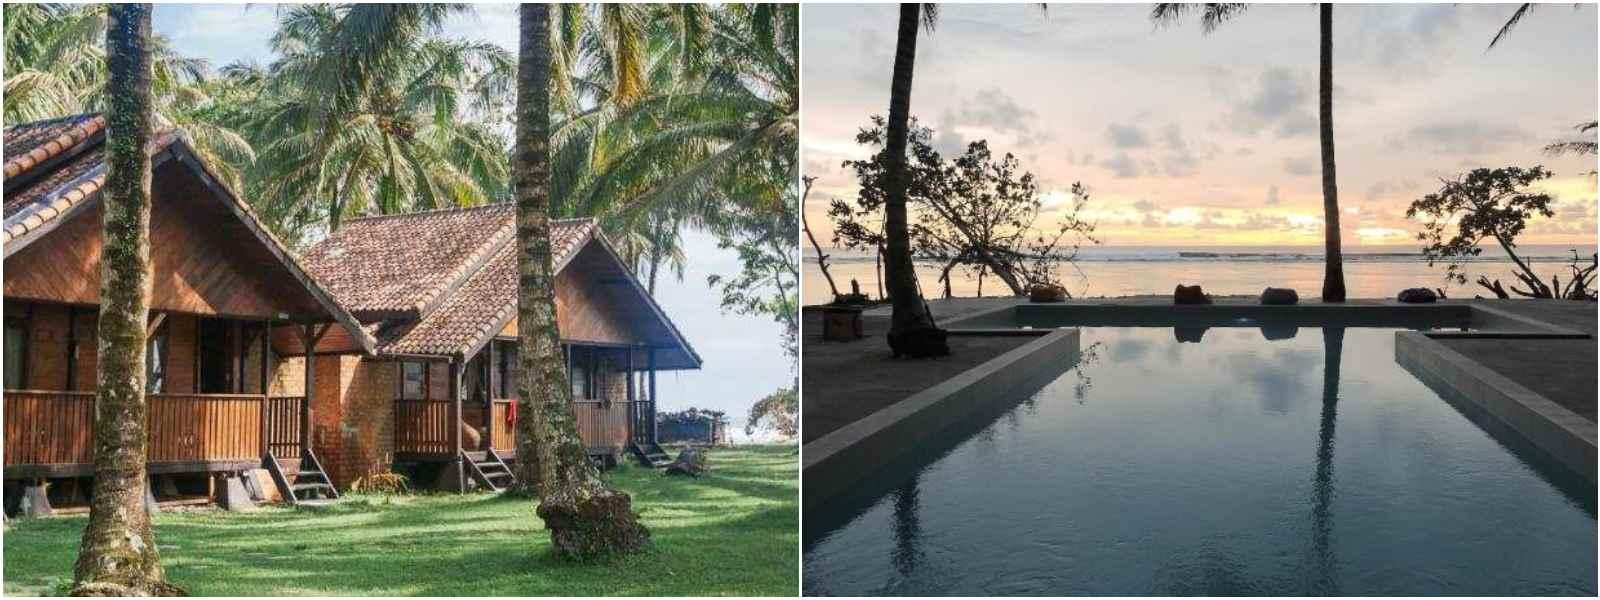 Sumatra Surf Resort   resor di lampung